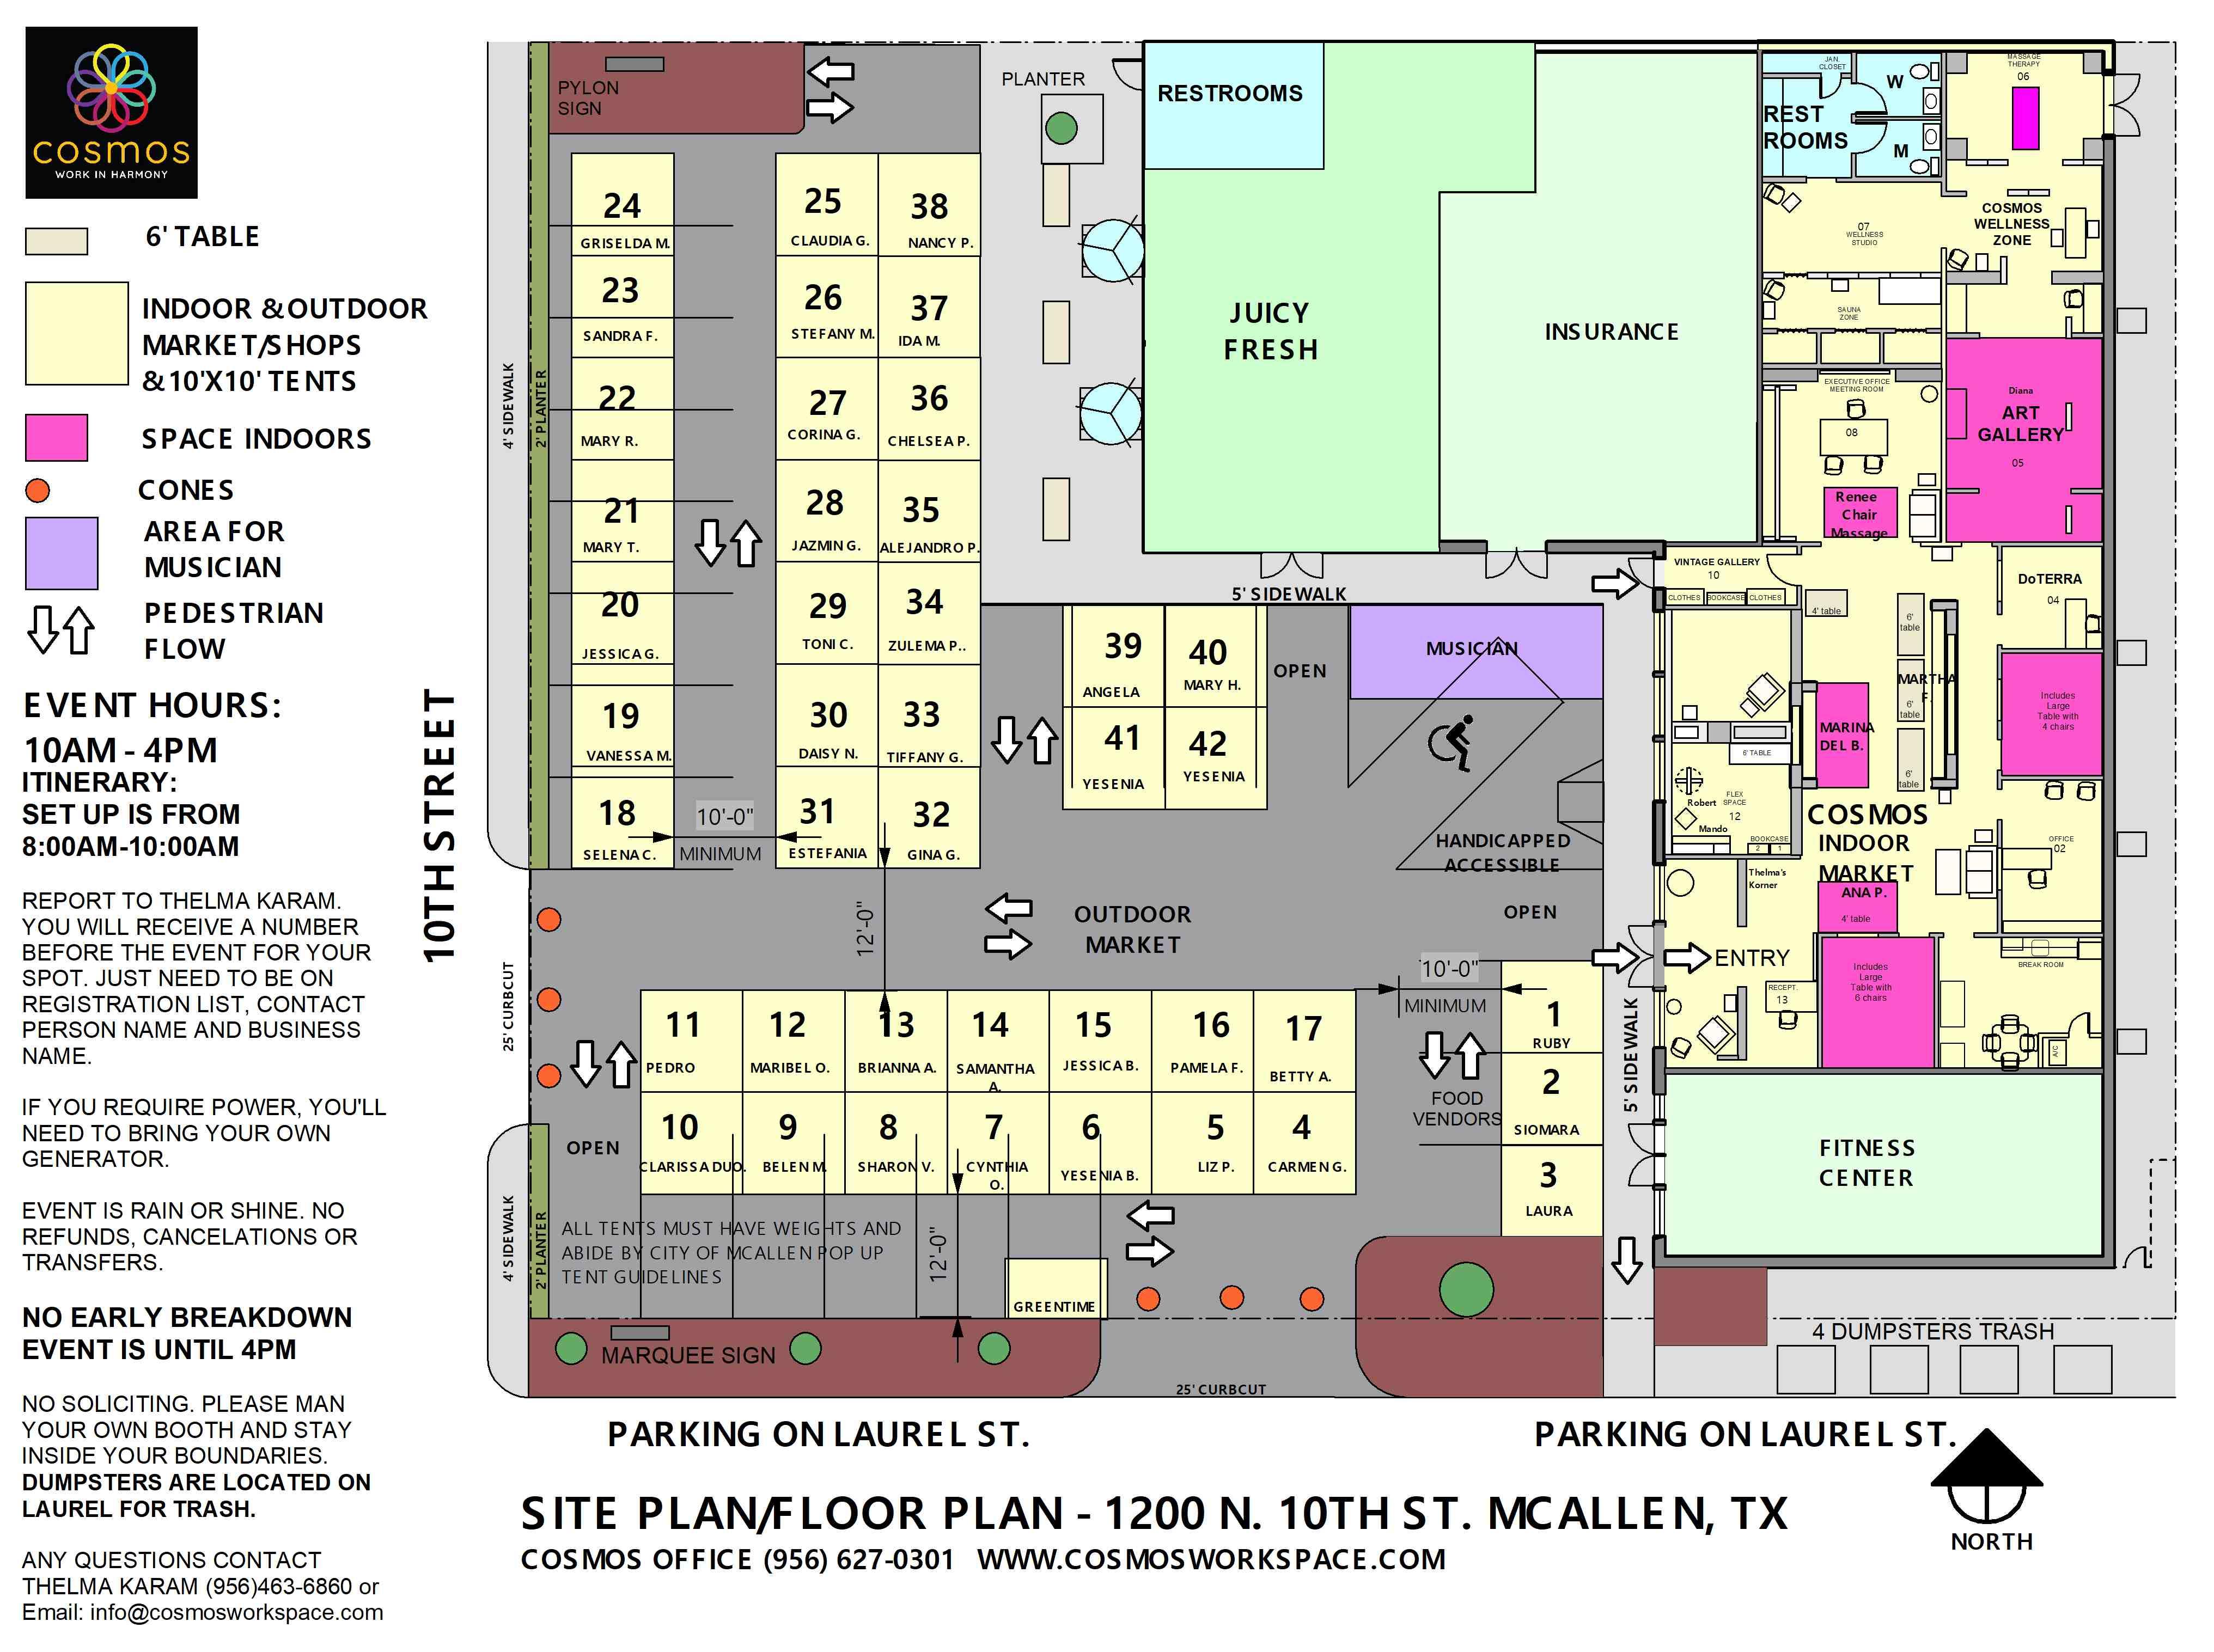 Sample Site Plan/Floor Plan